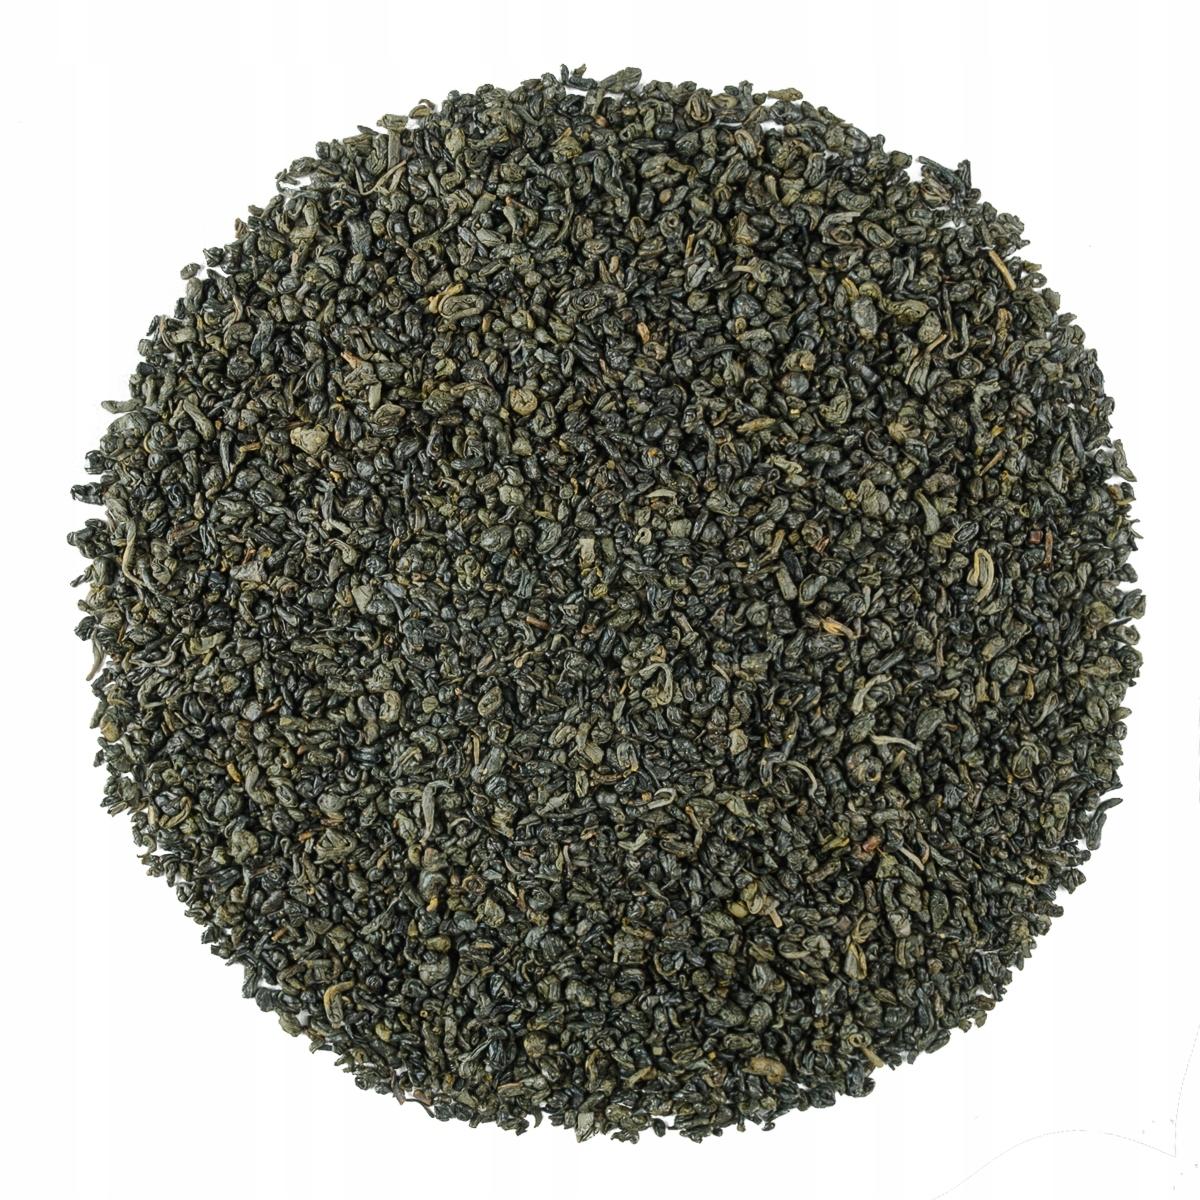 зеленый чай 0,5 кг China Gunpowder Super